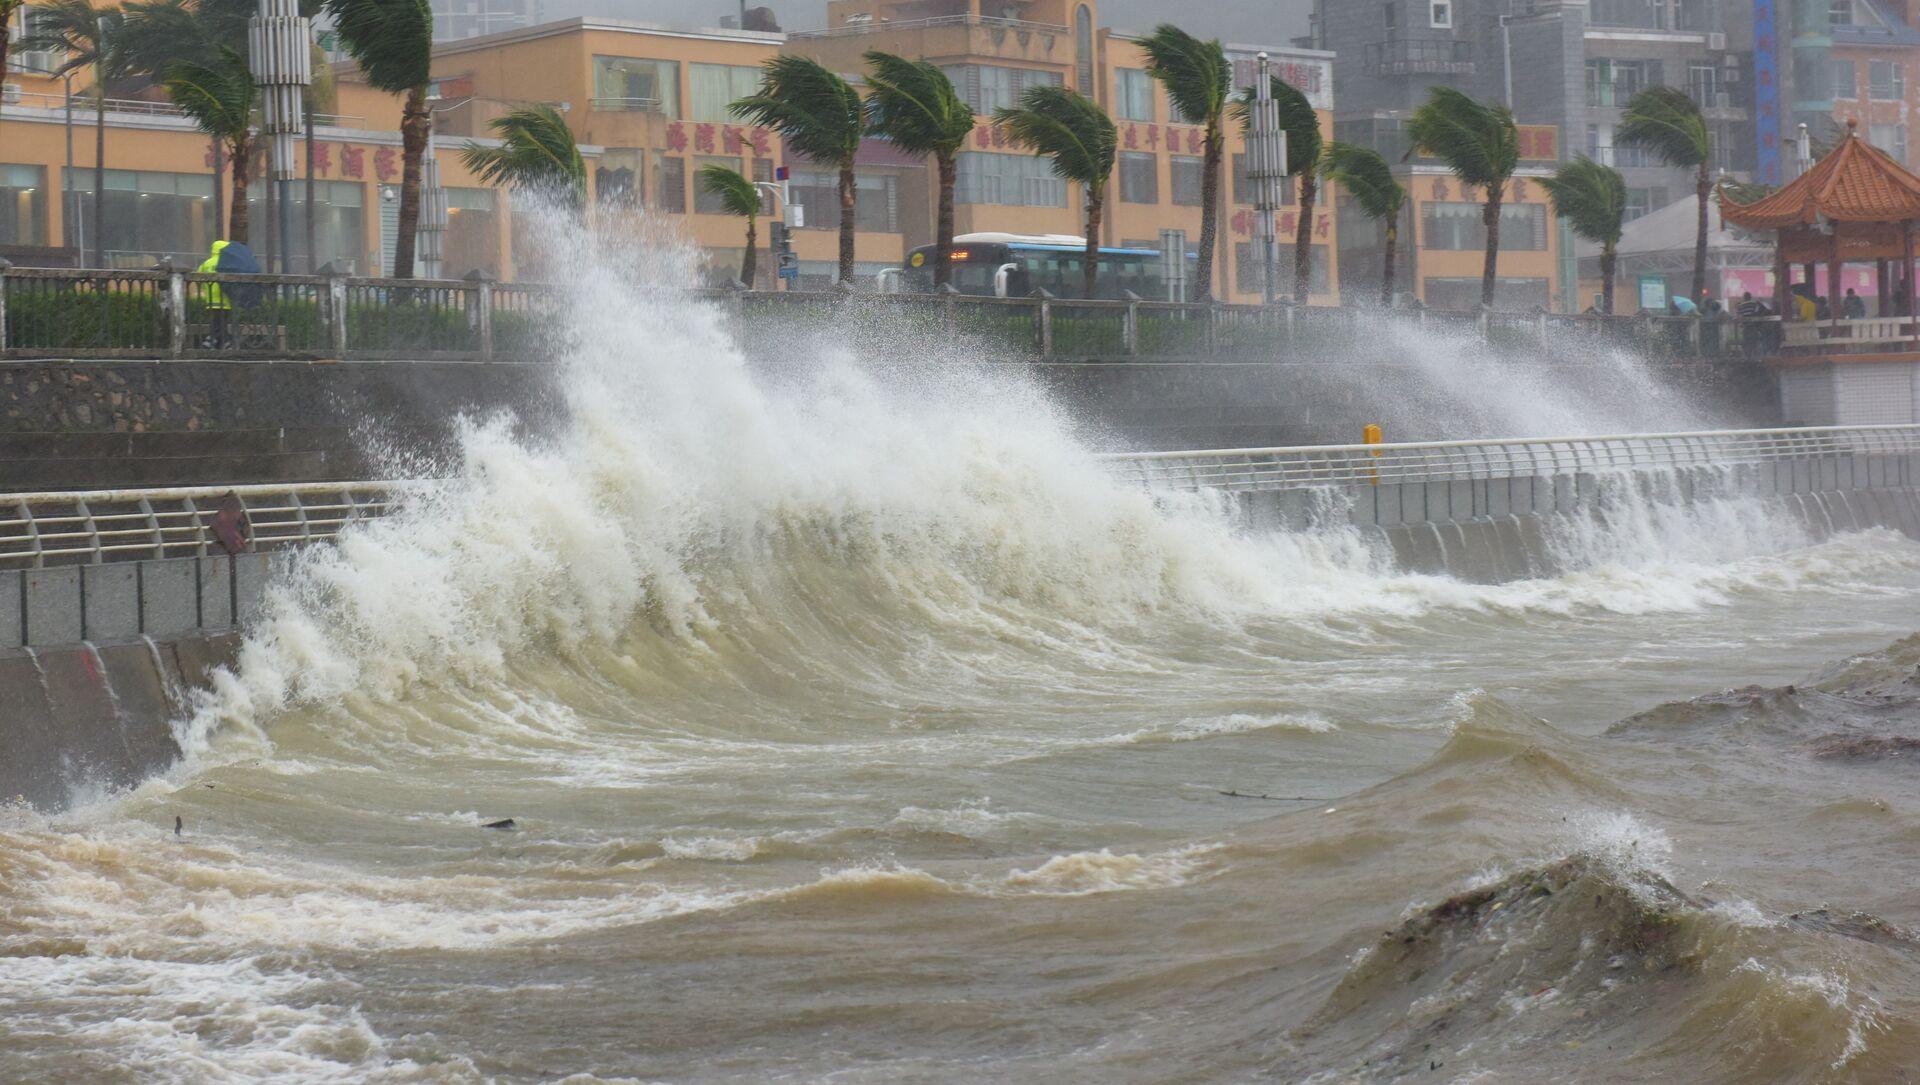 Waves triggered by Typhoon Haima crash against the shore in Shenzhen, China, October 21, 2016. Picture taken October 21, 2016 - Sputnik International, 1920, 25.07.2021